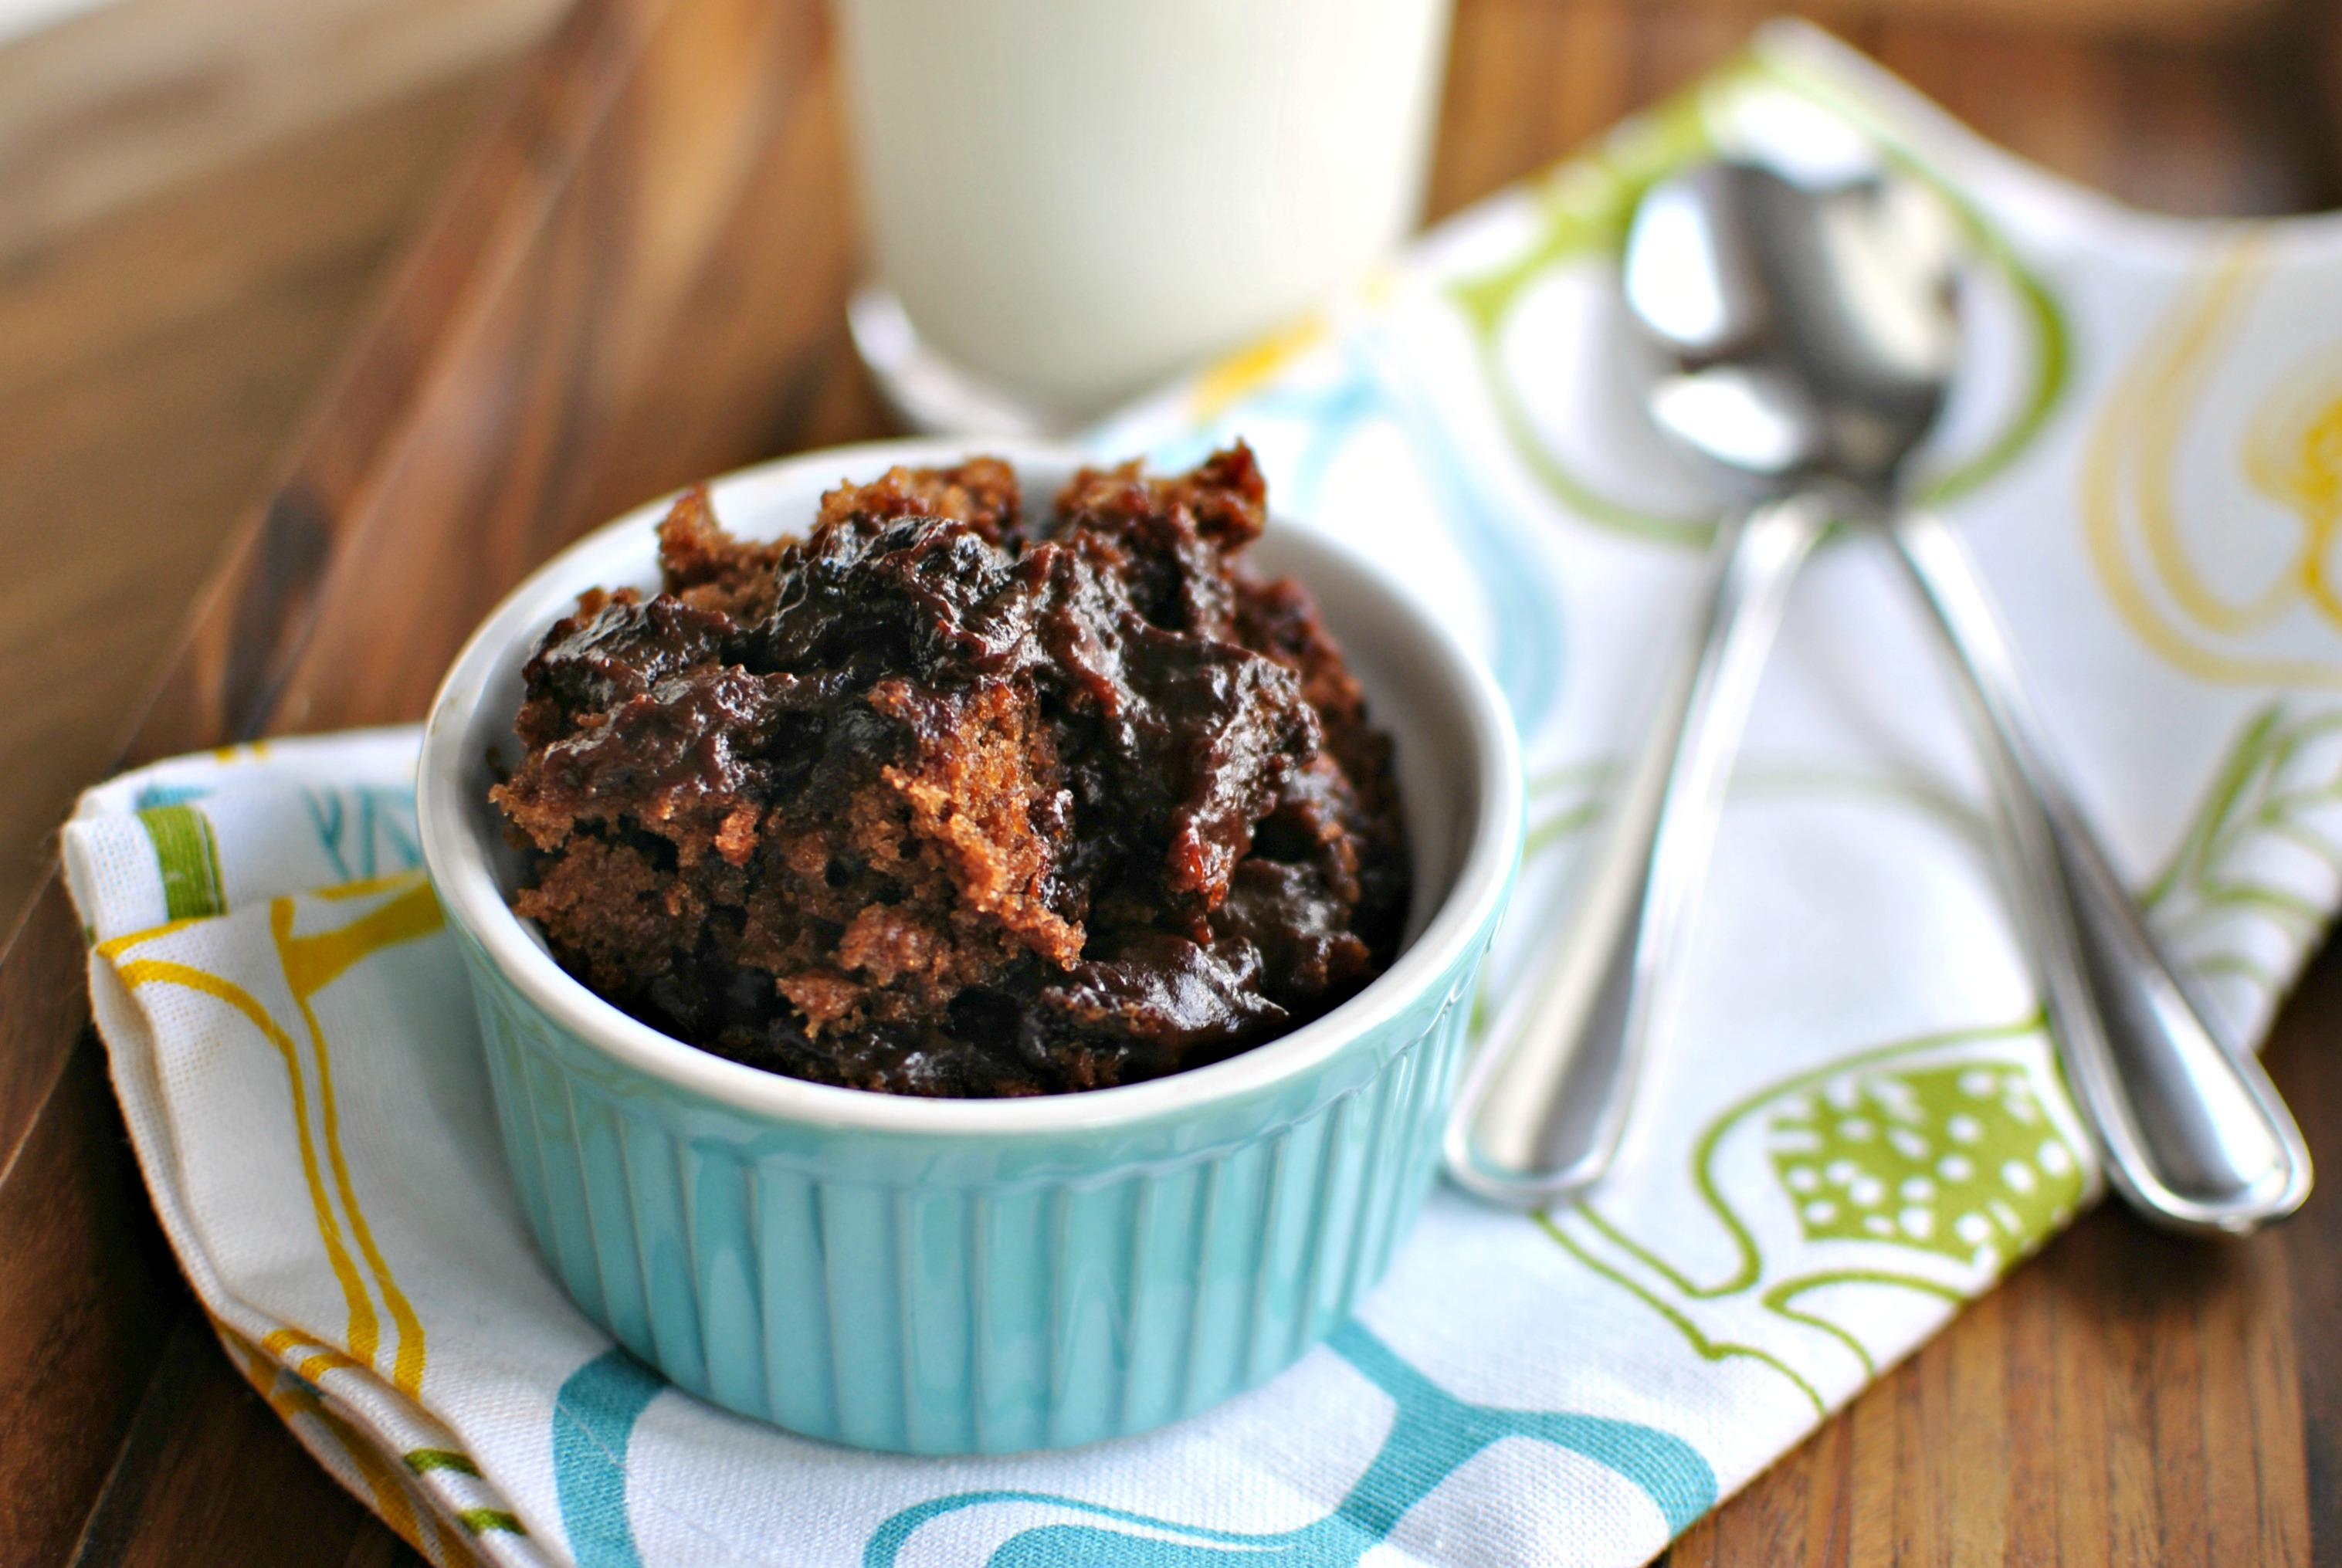 Upside down chocolate pudding cake recipe